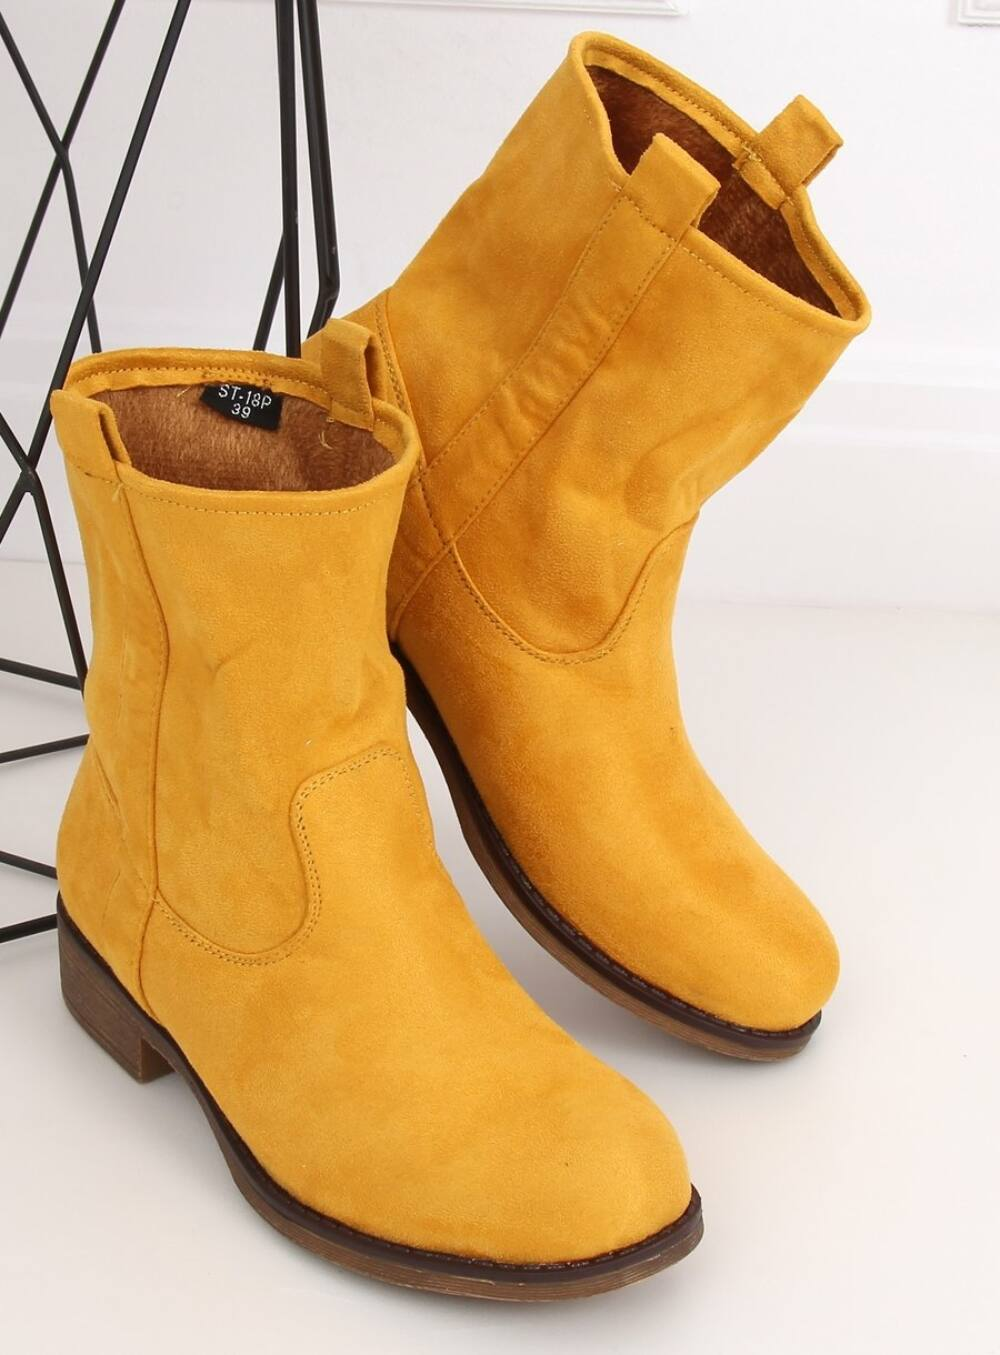 Női bokacsizma (ST-18P), sárga